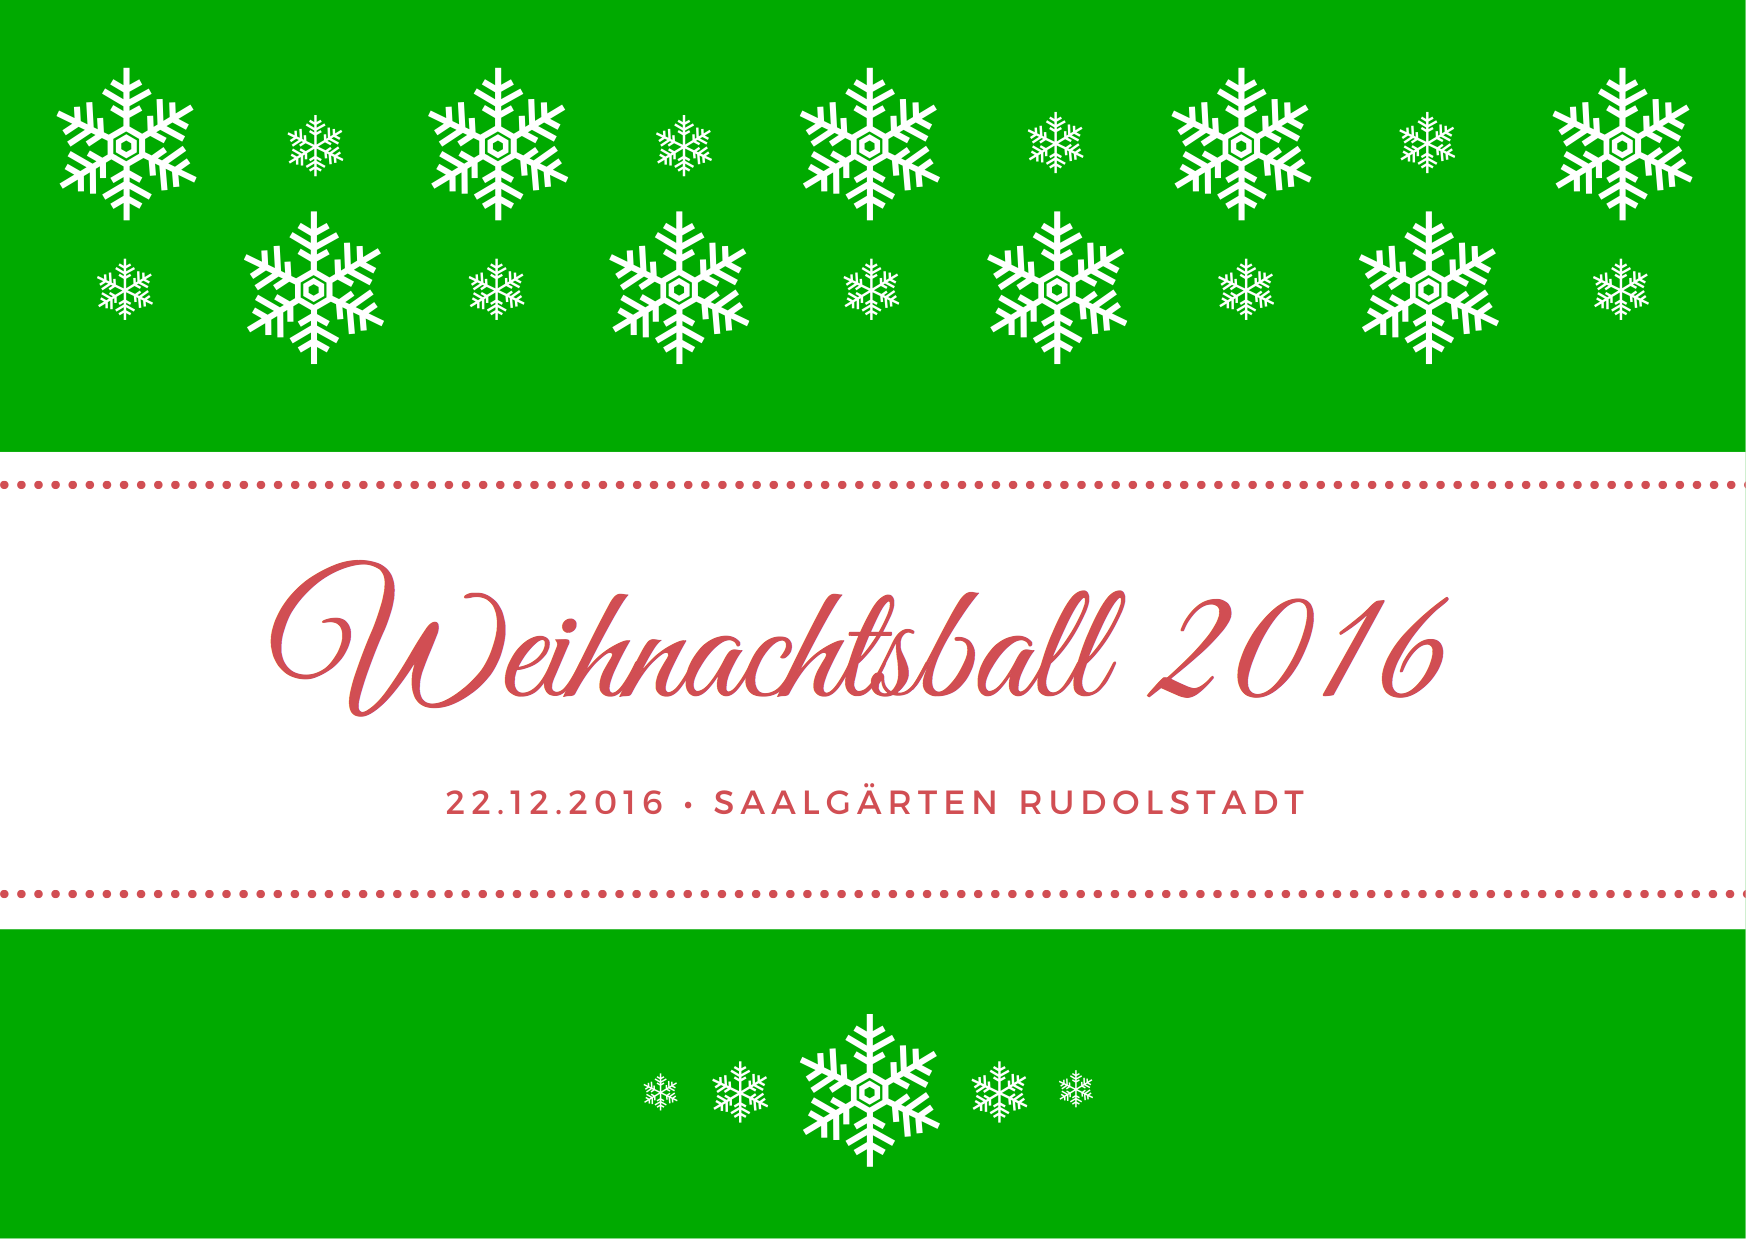 Weihnachtsball 2016